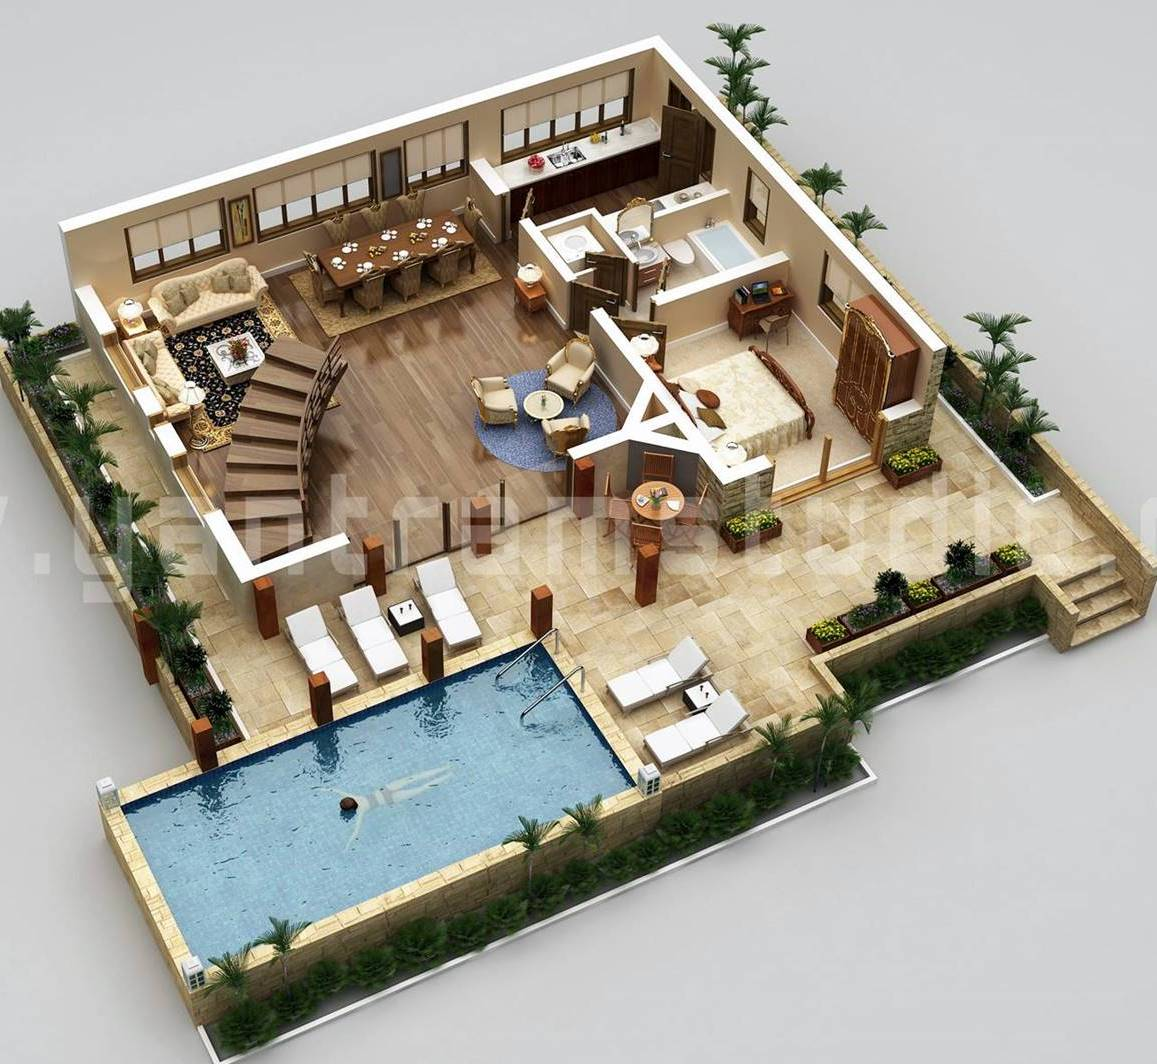 Custom%2BStylish%2BModern%2BHouse%2B3D%2BFloor%2BPlans%2B%2B%25282%2529 Customized Trendy Trendy Space 3-D Ground Plans Interior